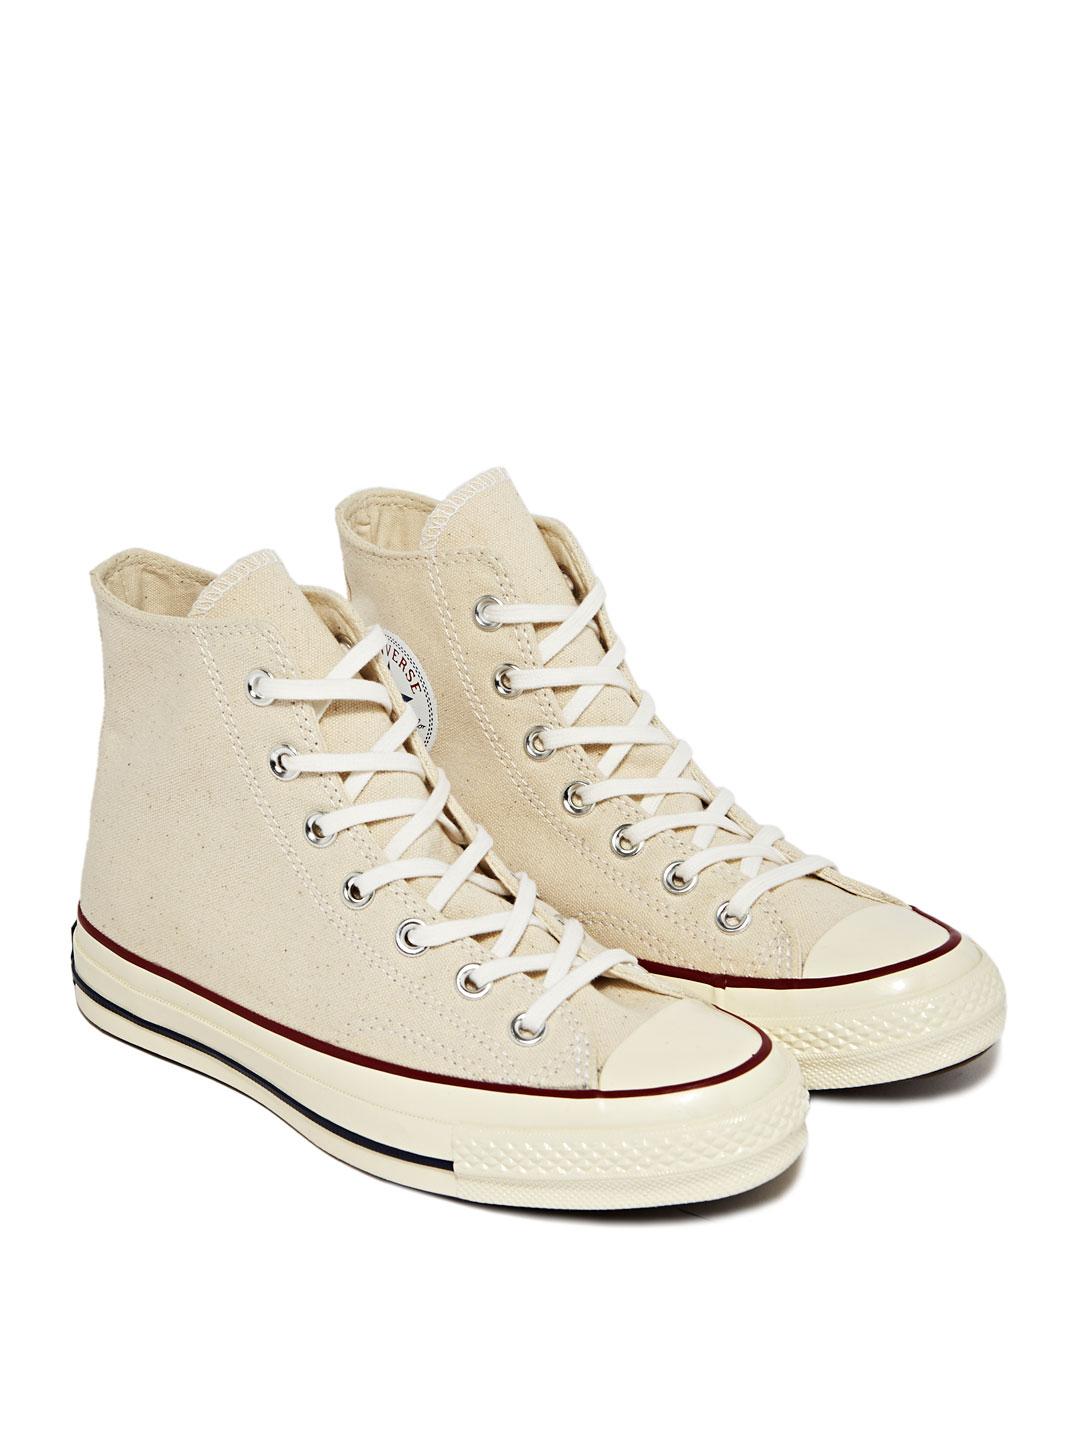 Converse High Chuck Taylor 1970s All Star Bouclé Sneakers Très Bon Marché HrkyLAIB